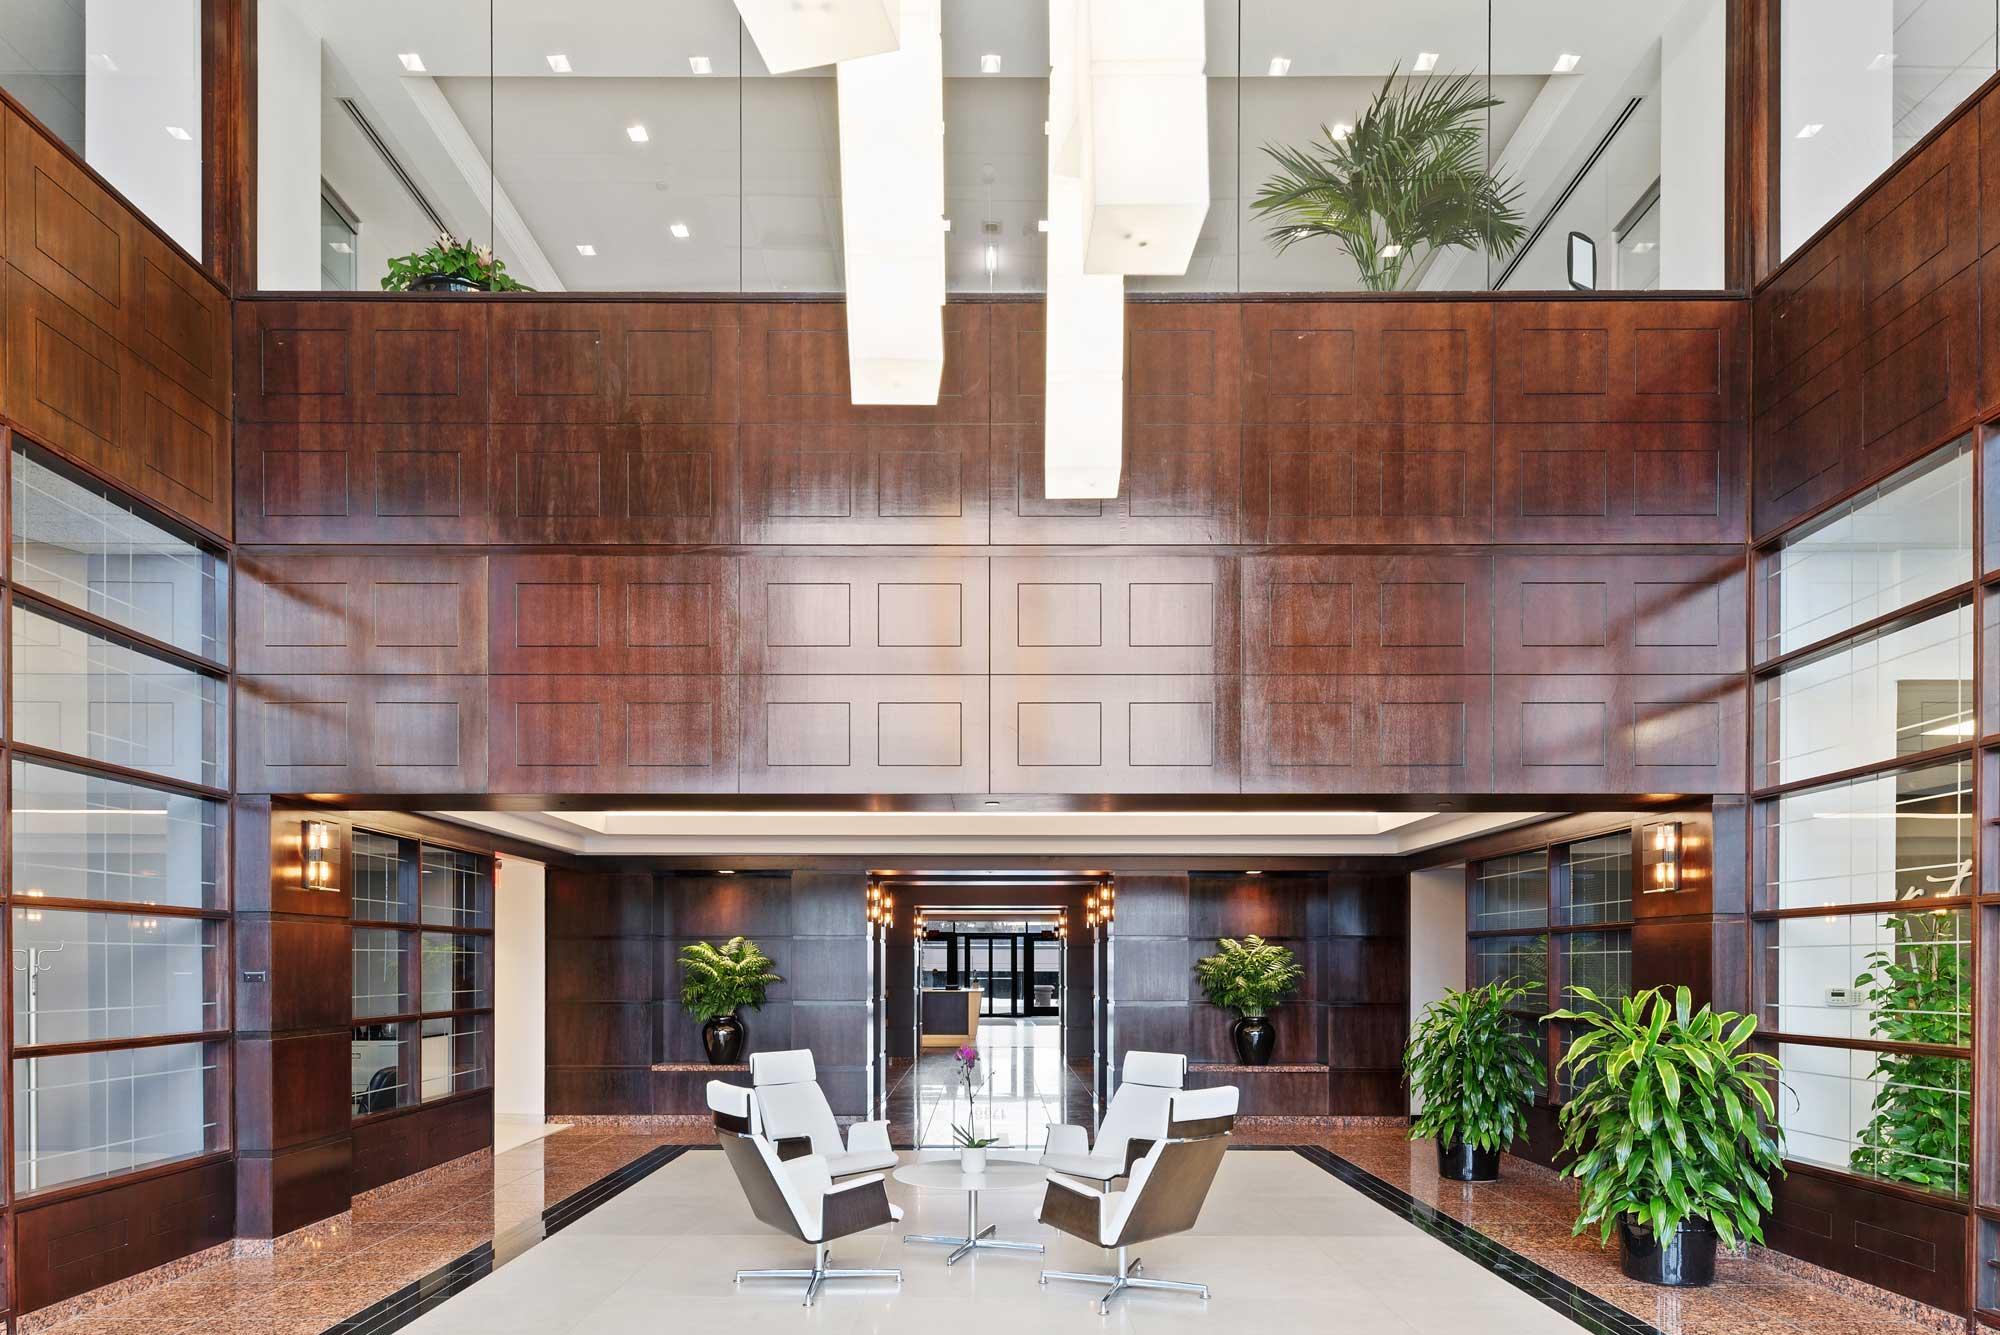 2 Century Center Lobby, Schaumburg, IL